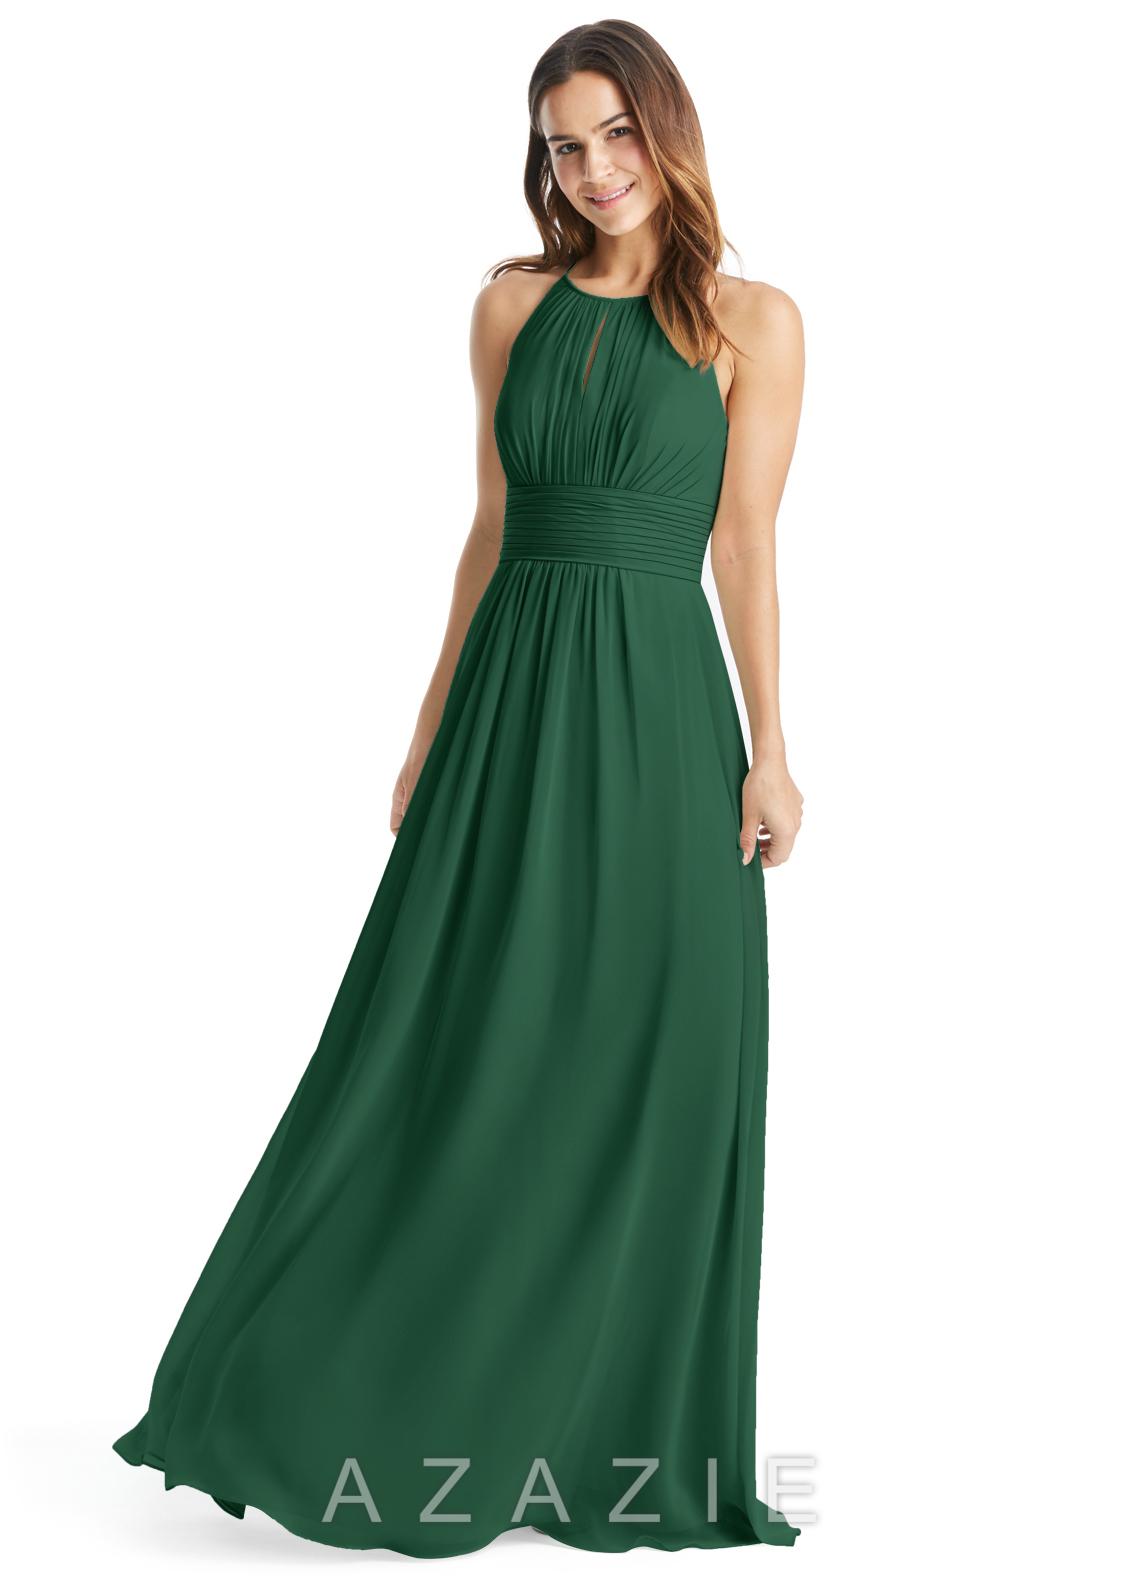 Azazie bonnie bridesmaid dress azazie color dark green ombrellifo Images